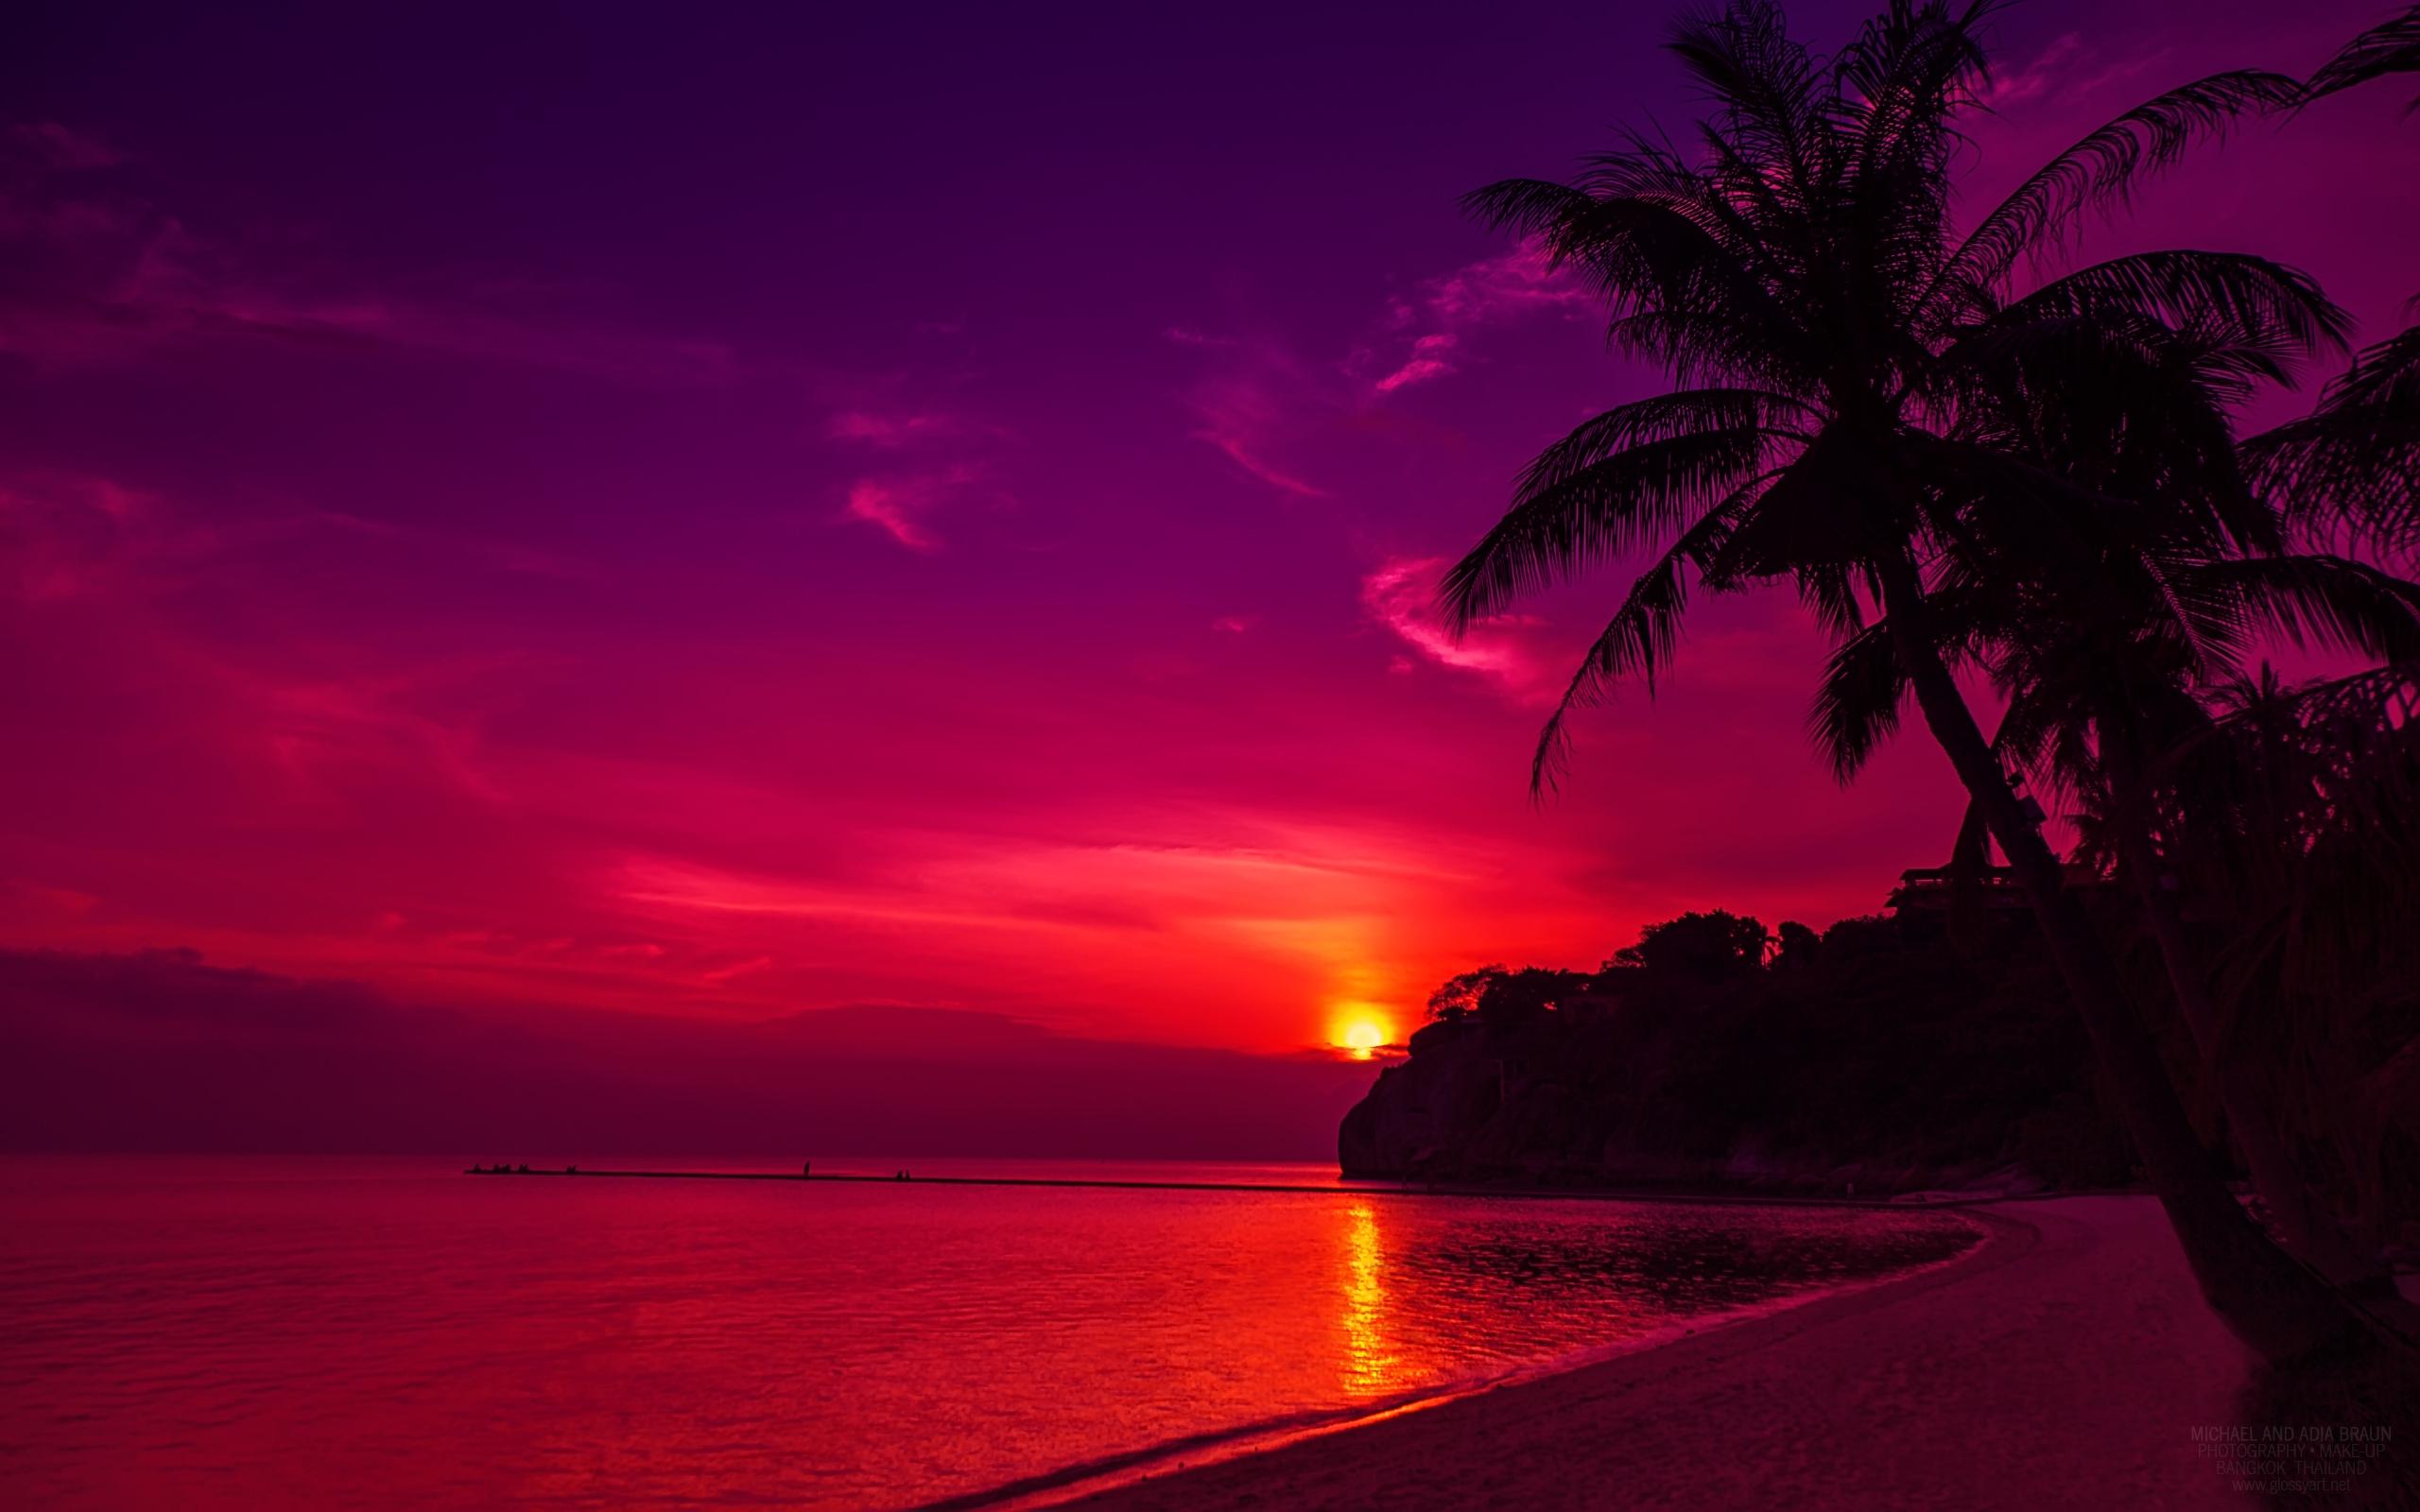 Thailand Beach Sunset Wallpapers | HD Wallpapers